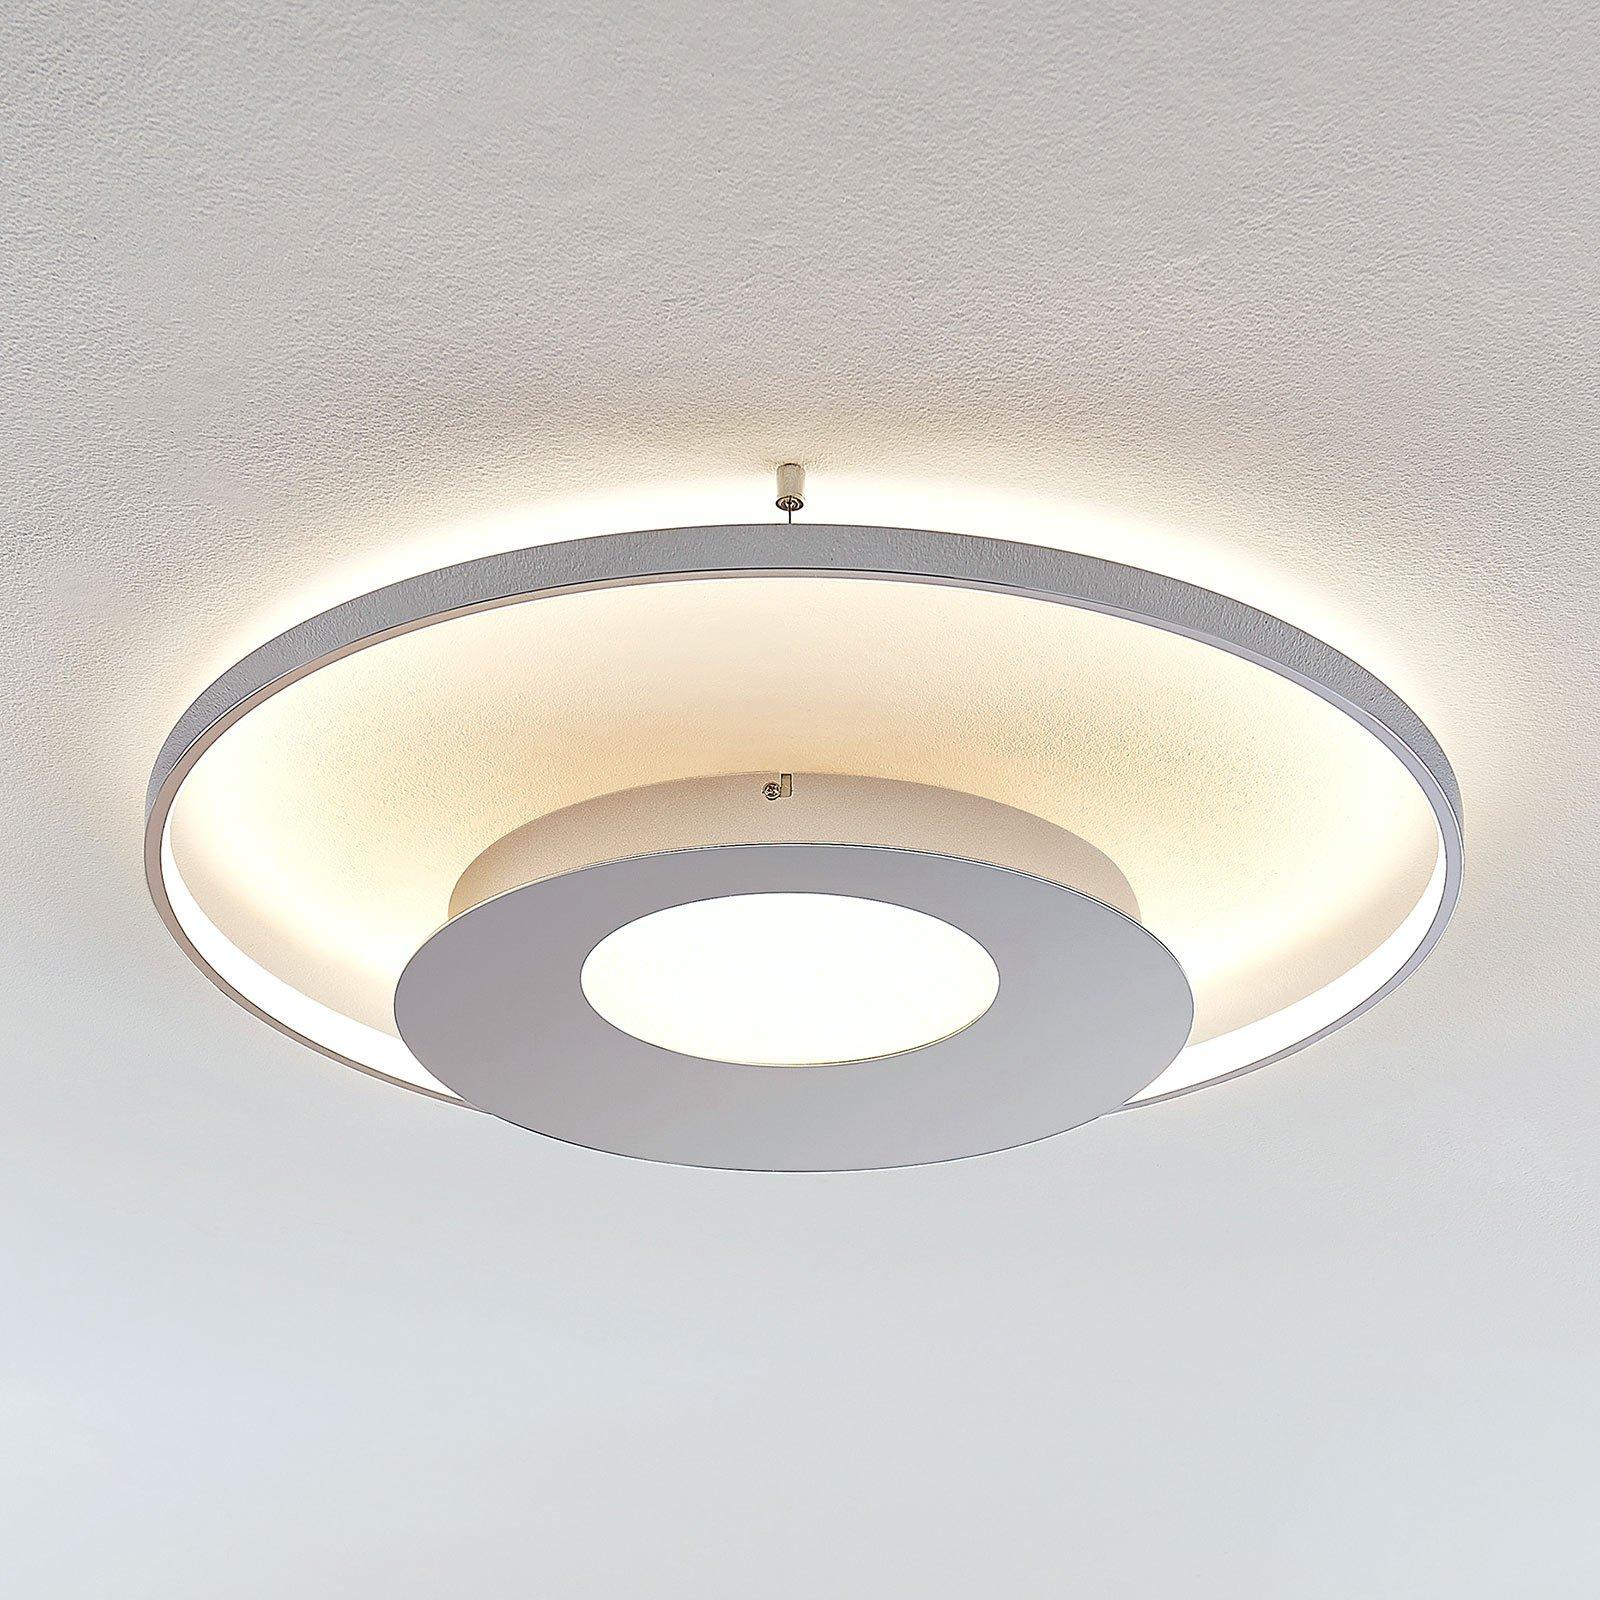 LED-taklampe Anays, rund, 62 cm